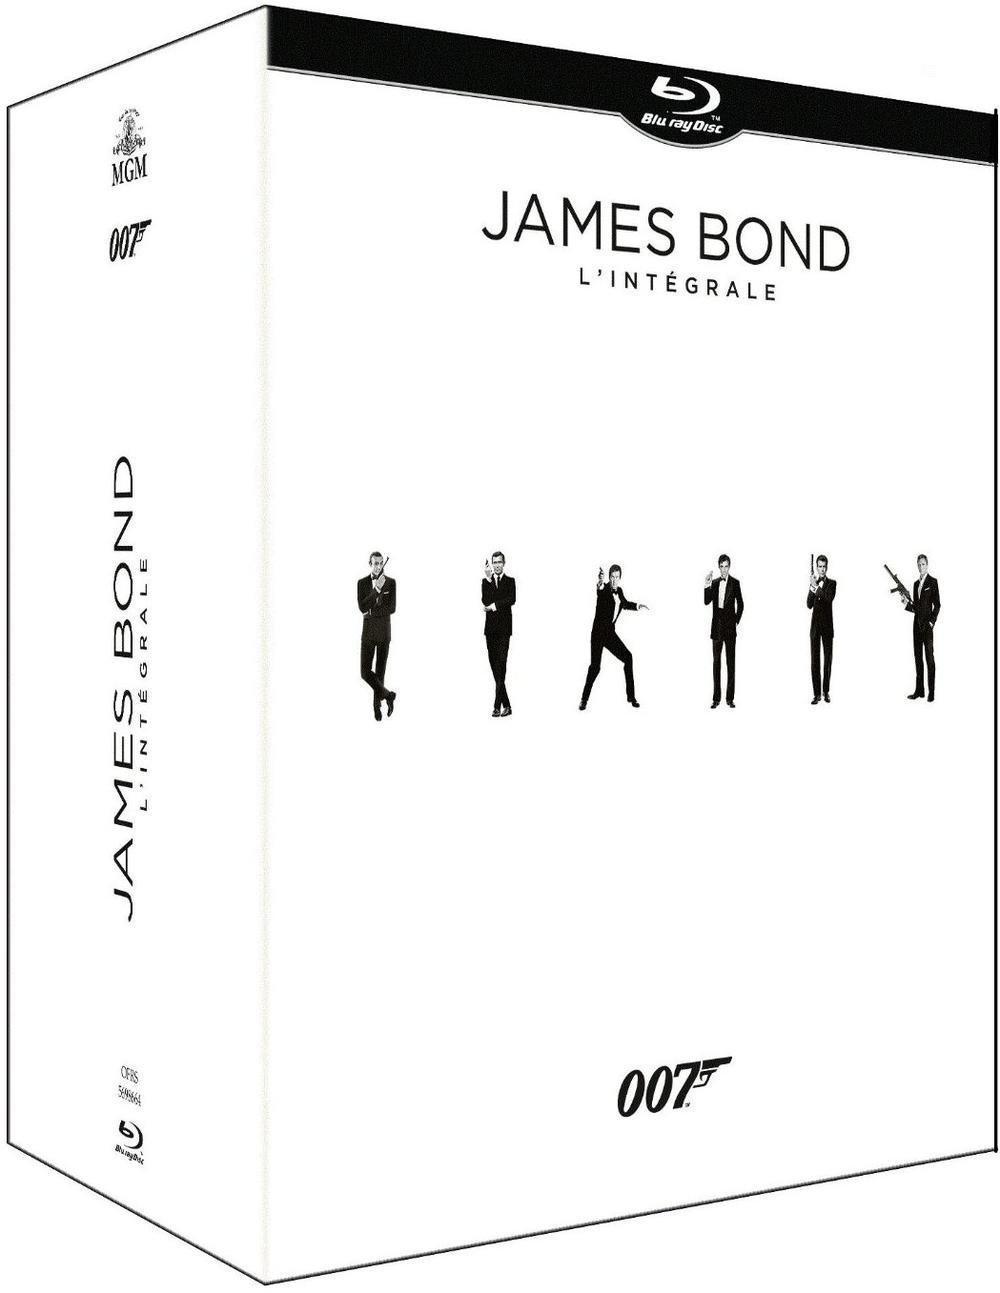 Coffret blu-ray  intégrale James Bond 007 - 24 films - Edition limitée